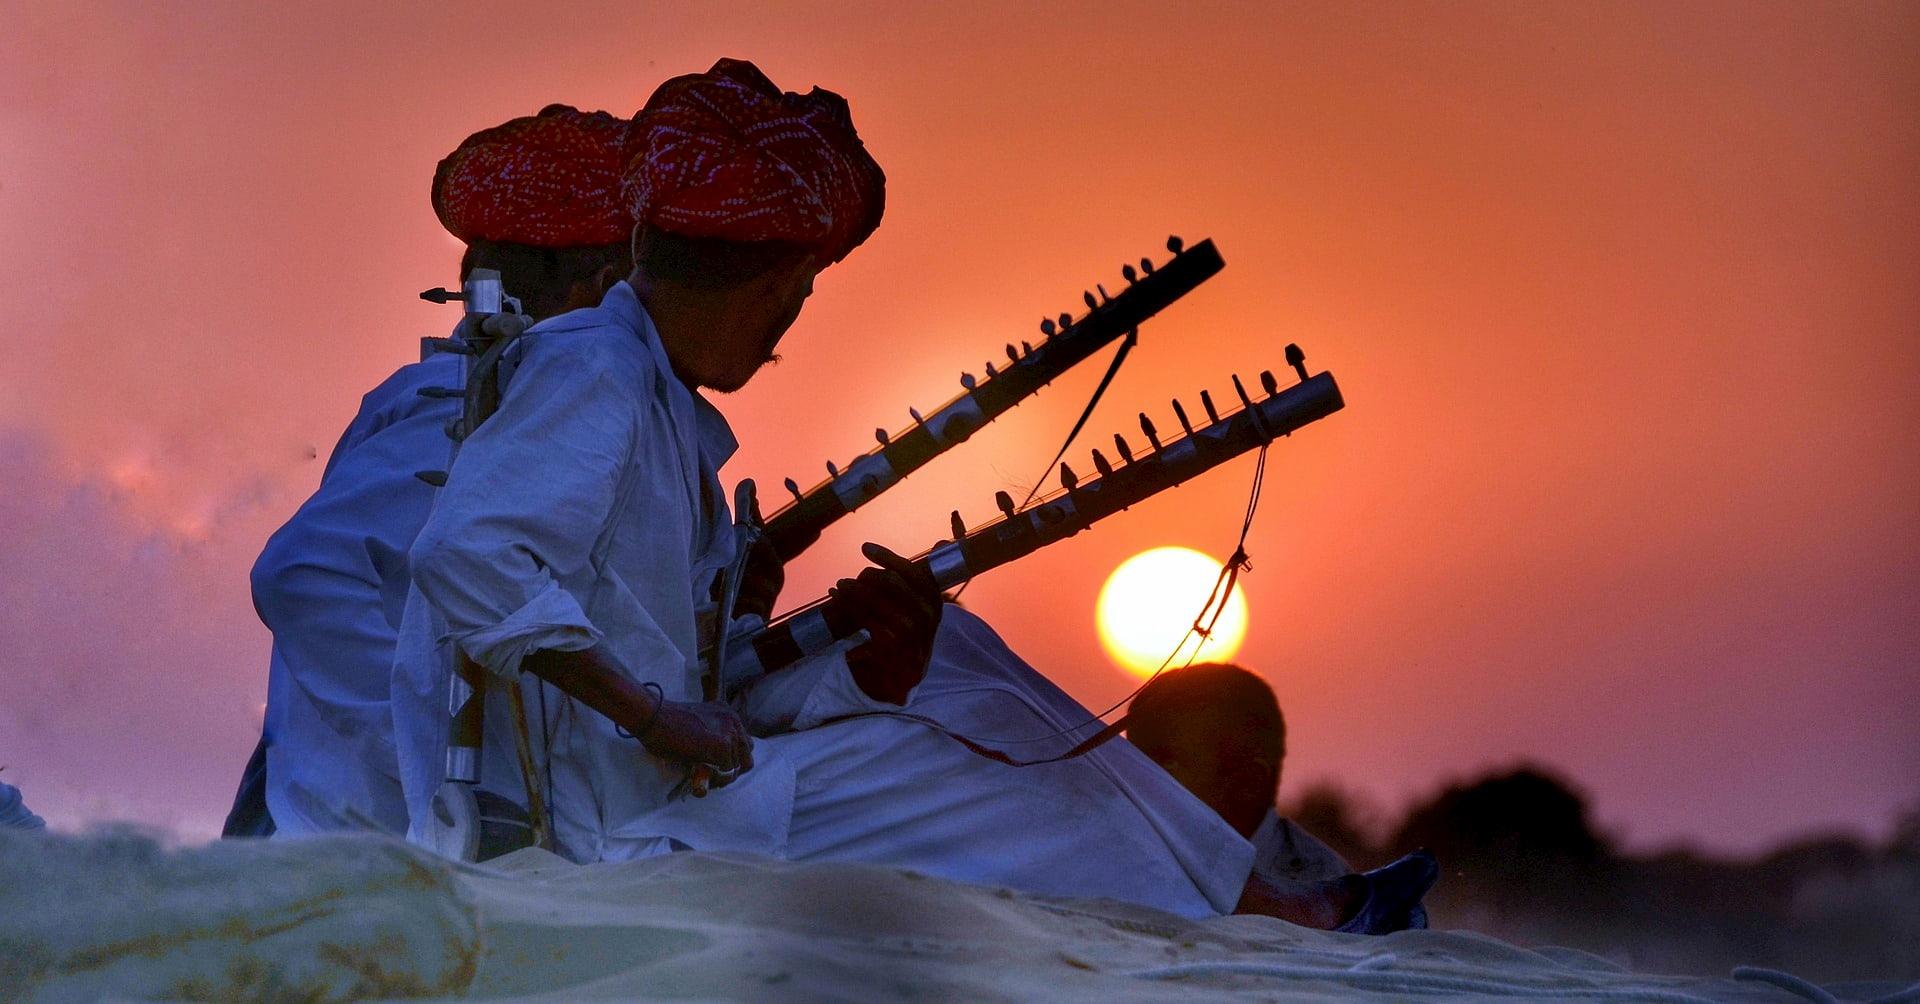 Adventour - India - tradizioni